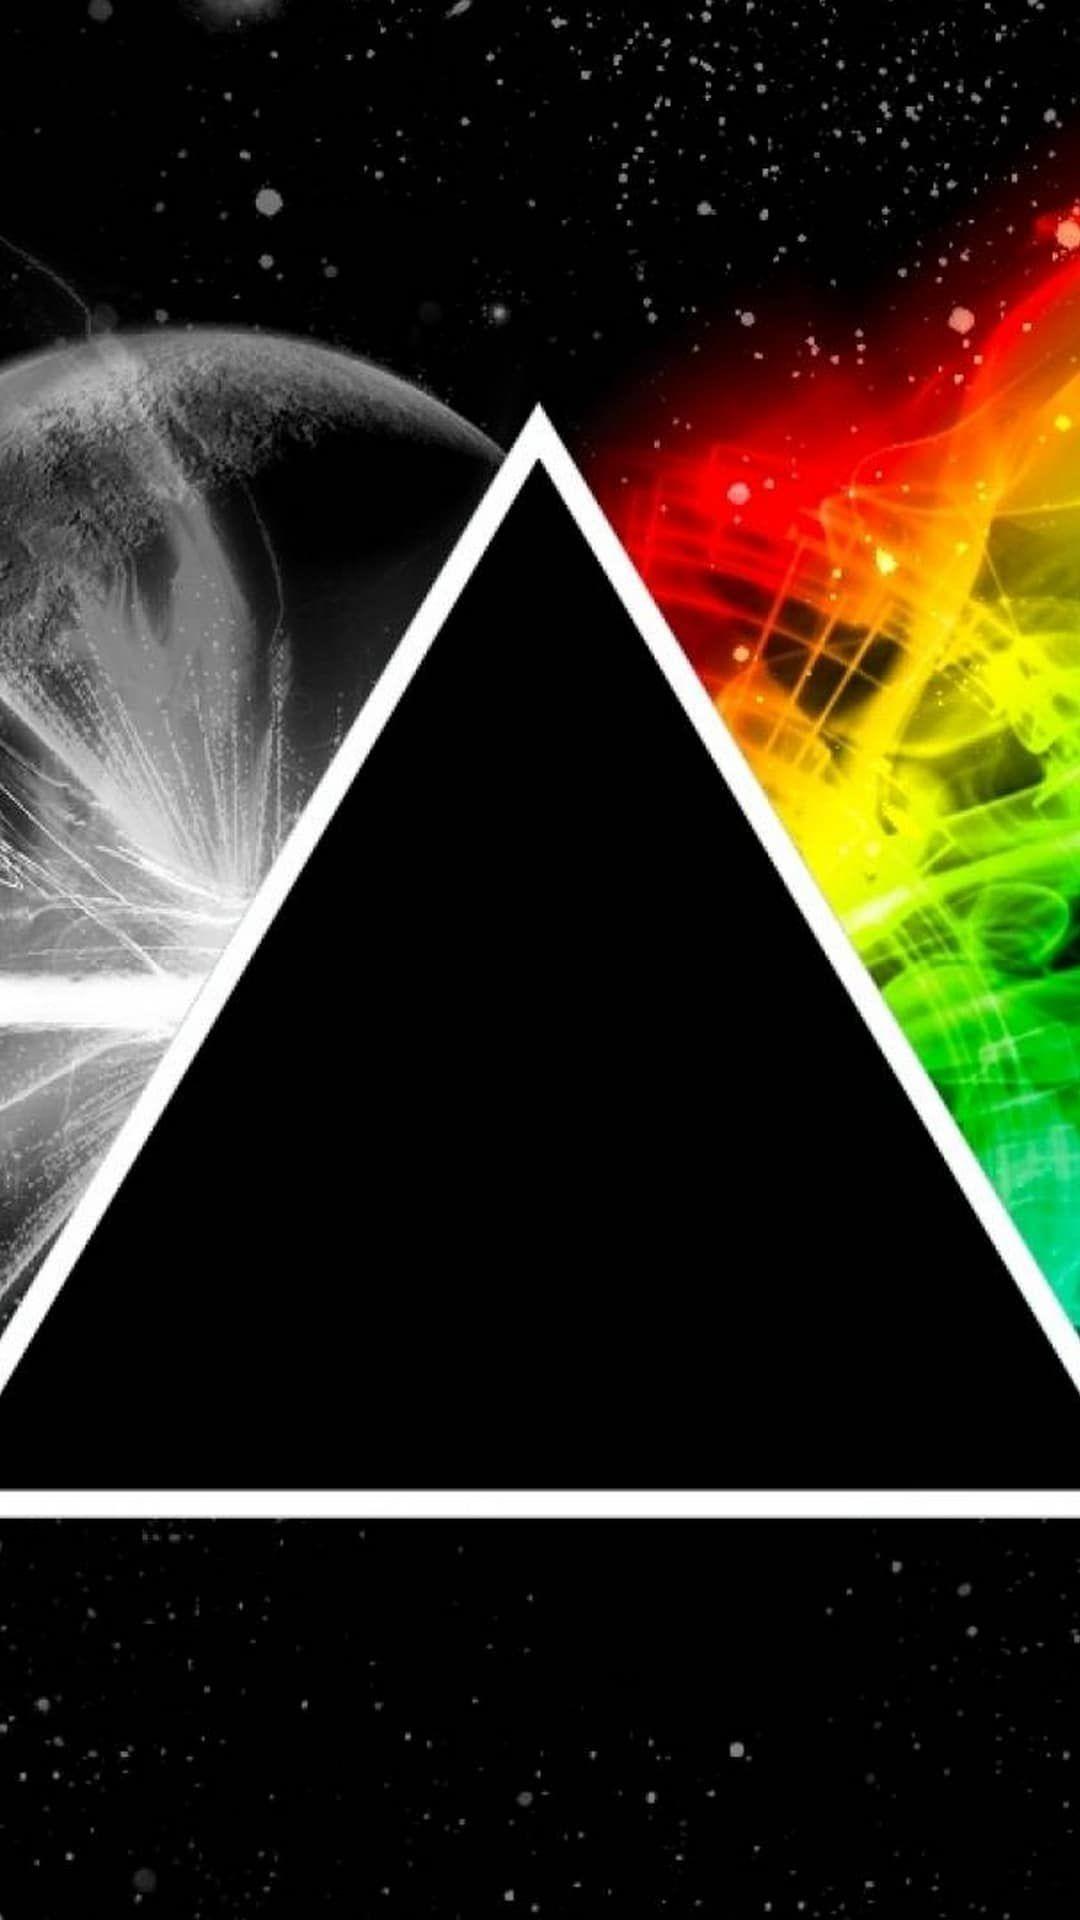 Http Wallpaperformobile Org 13962 Pink Floyd Wallpapers Html Pink Floyd Wallpapers Pink Floyd Wallpaper Wallpaper Floyd